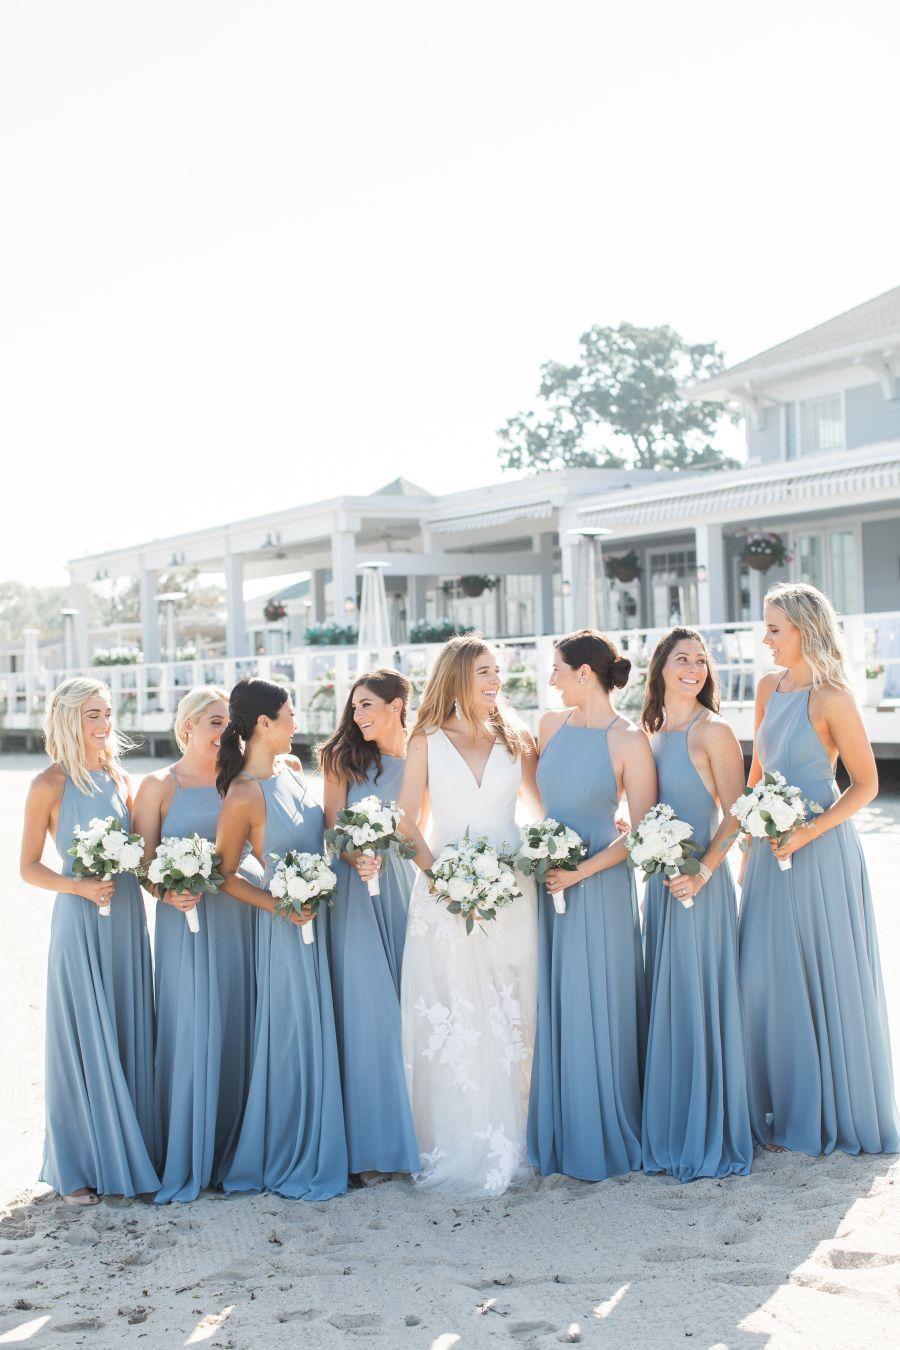 Beautiful Blues Stunning Watercolors Makes This Summer Wedding Shine Wedding Bridesmaid Dresses Wedding Bridesmaids Blue Bridesmaid Dresses